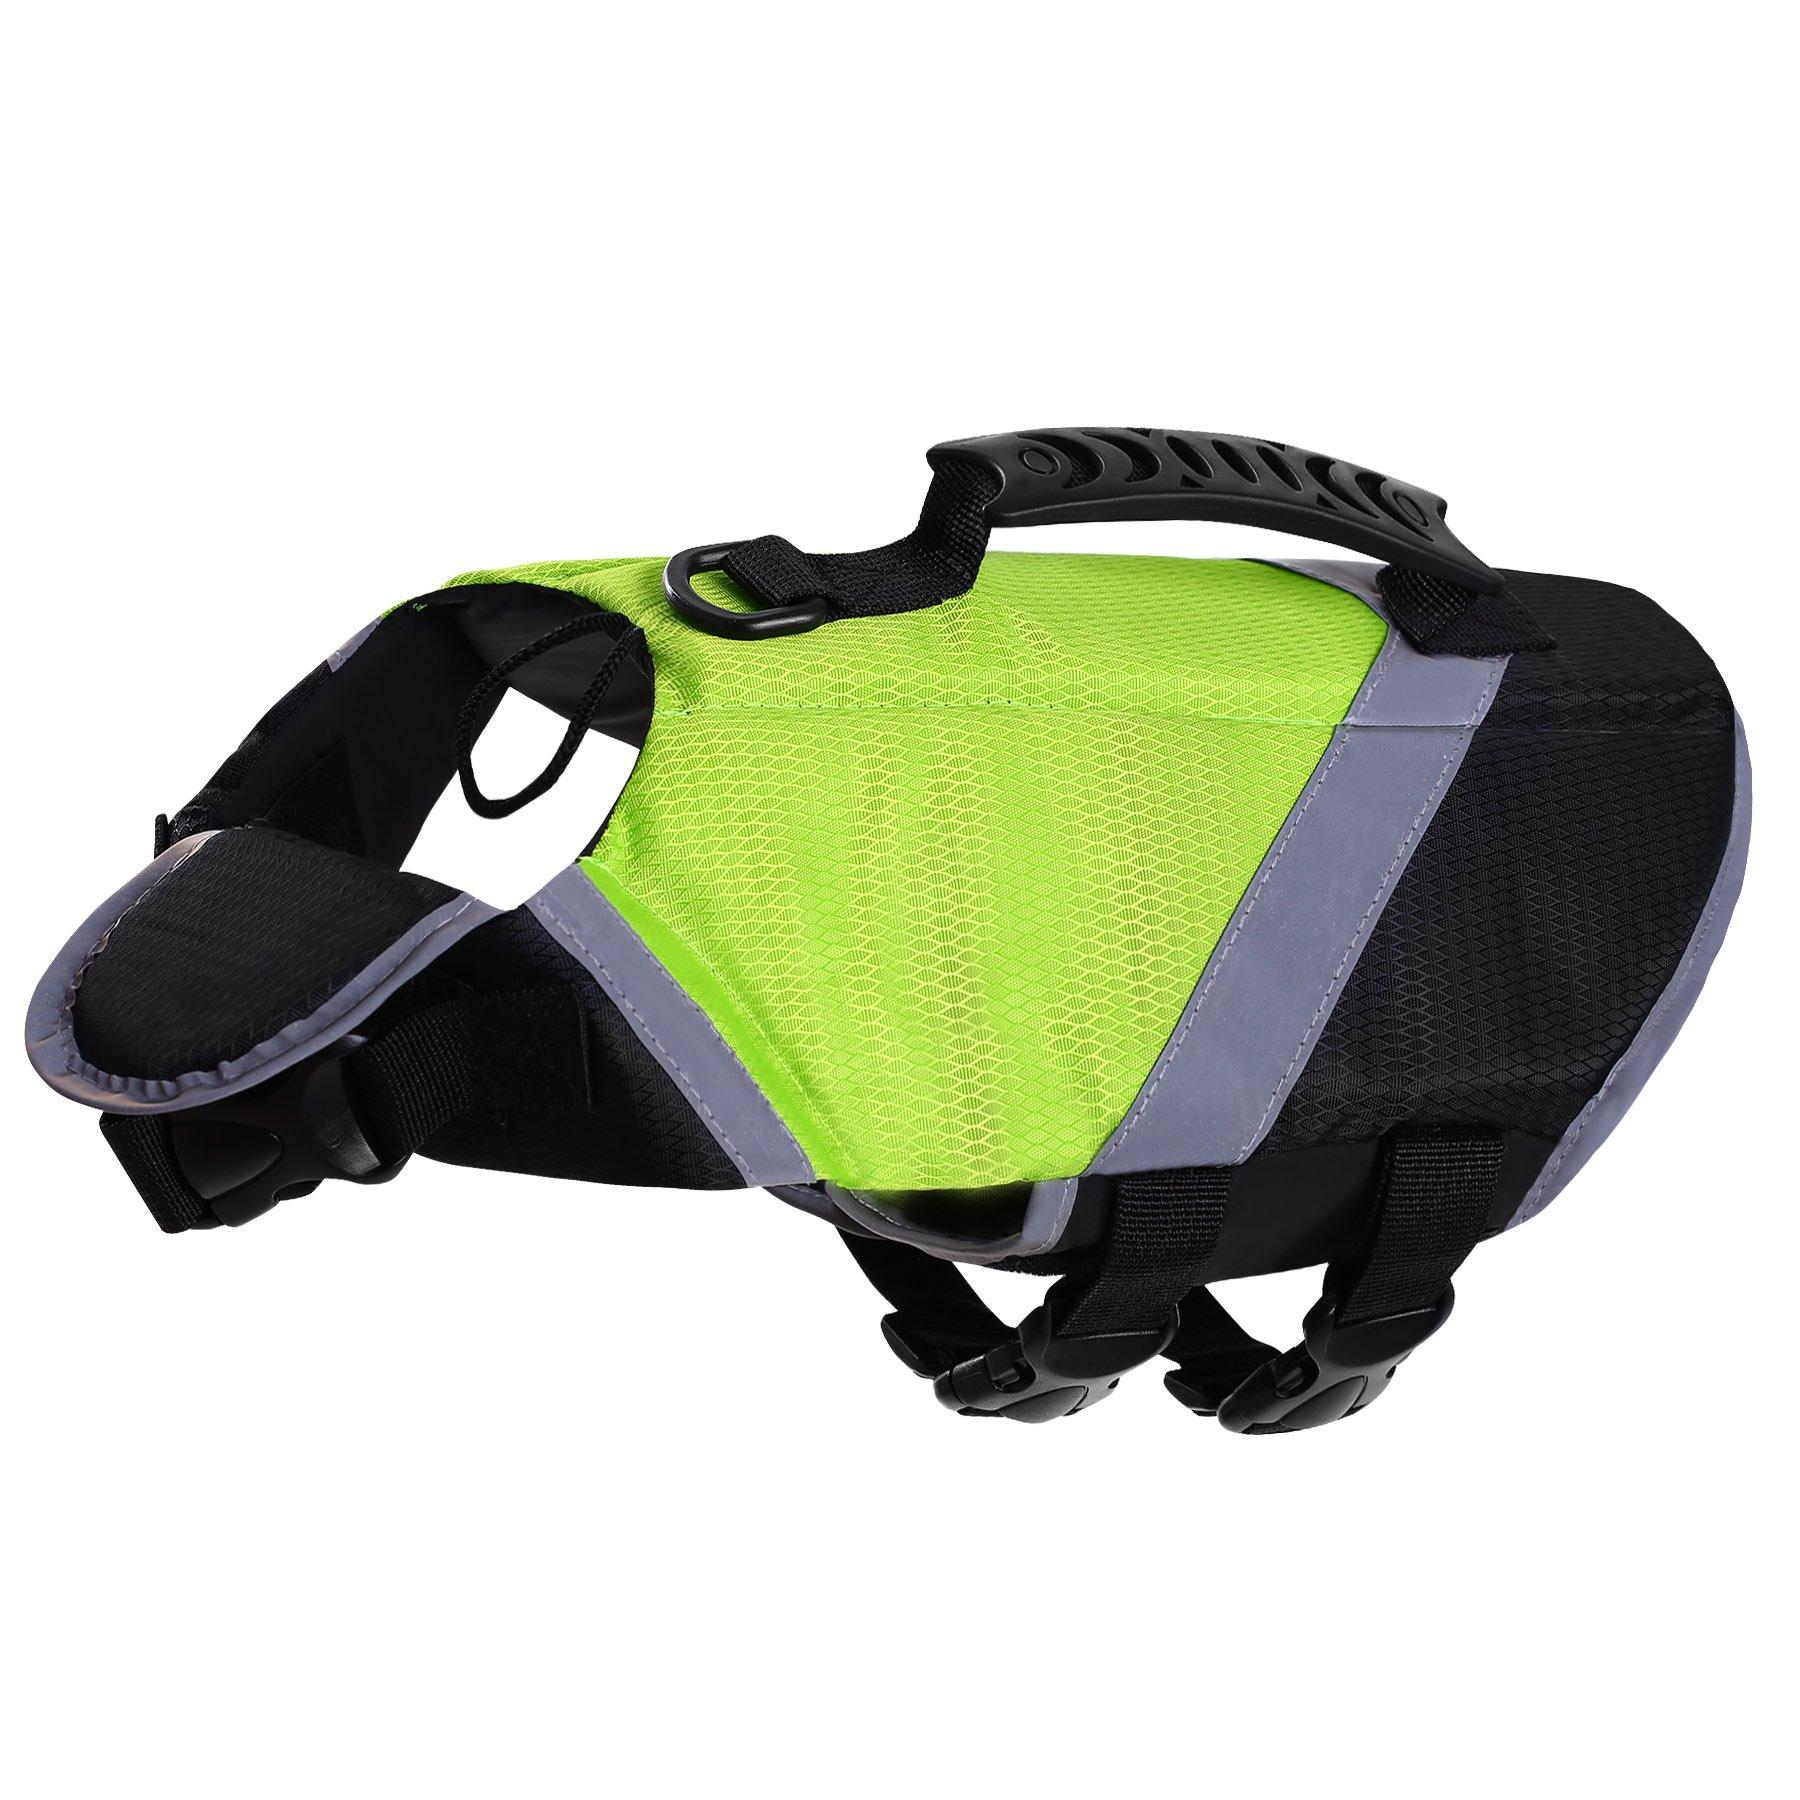 SAWMONG Dog Life Jacket, Pet Swim Vest, Dogs Life Preserver, Floatation Coat with Reflective Stripe Bulldog Terrier Corgis Saver in Orange Green for Small Medium Large Dogs Swimming Boating Hunting